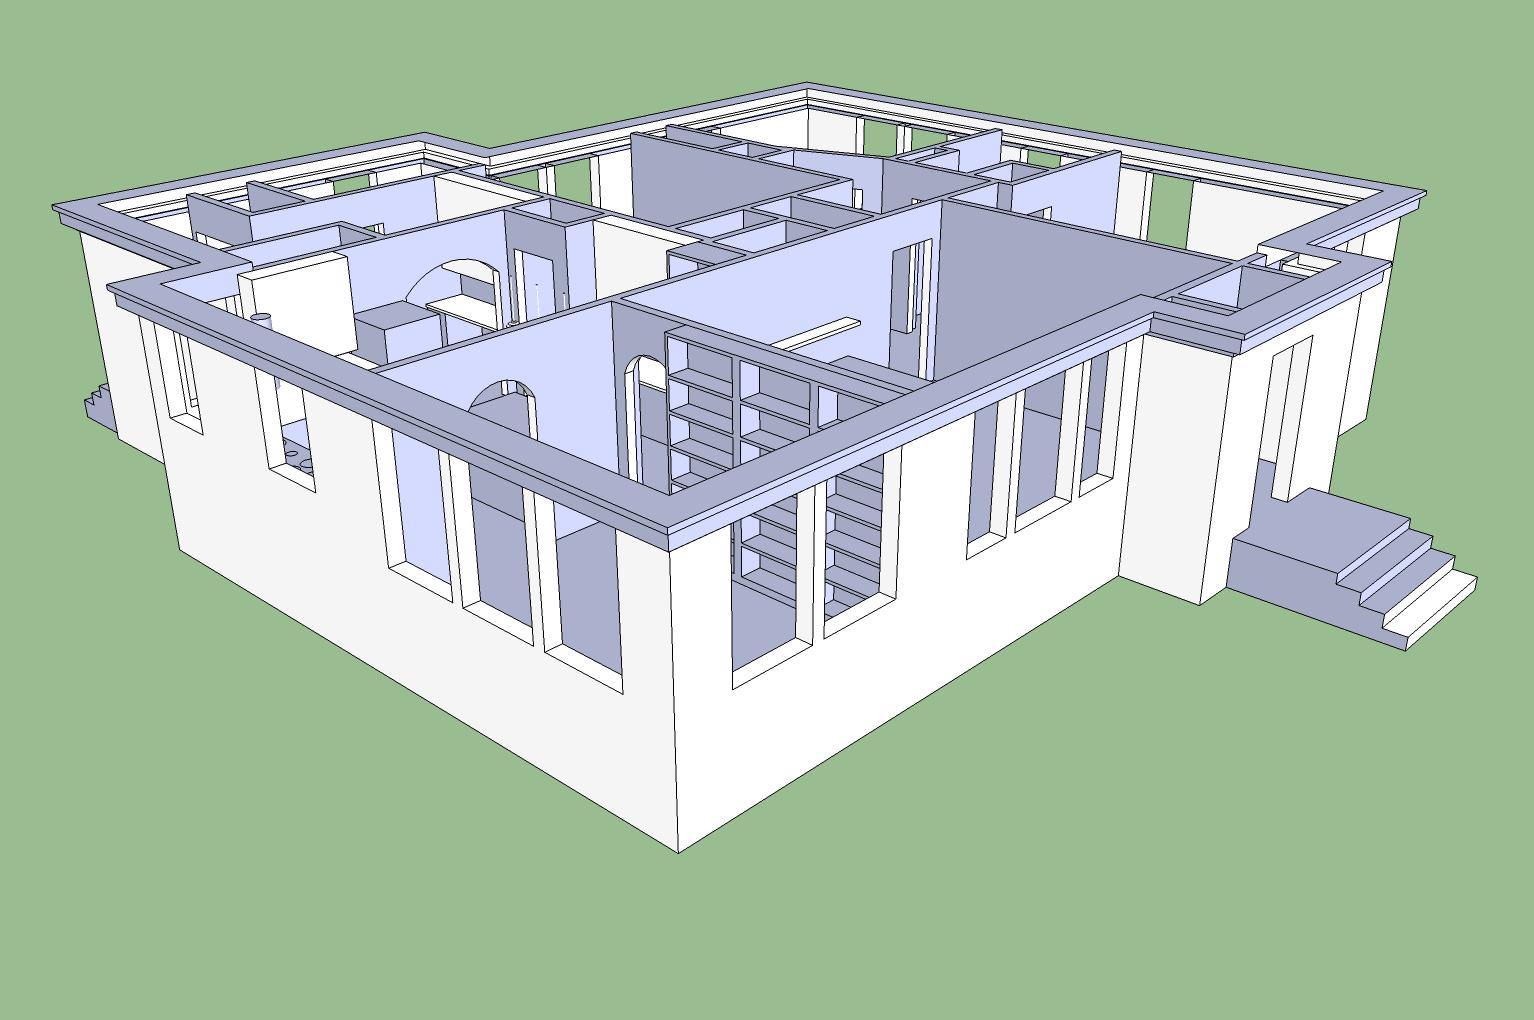 clienthouse sketchup modern building design plan modern house,Google Home Plans